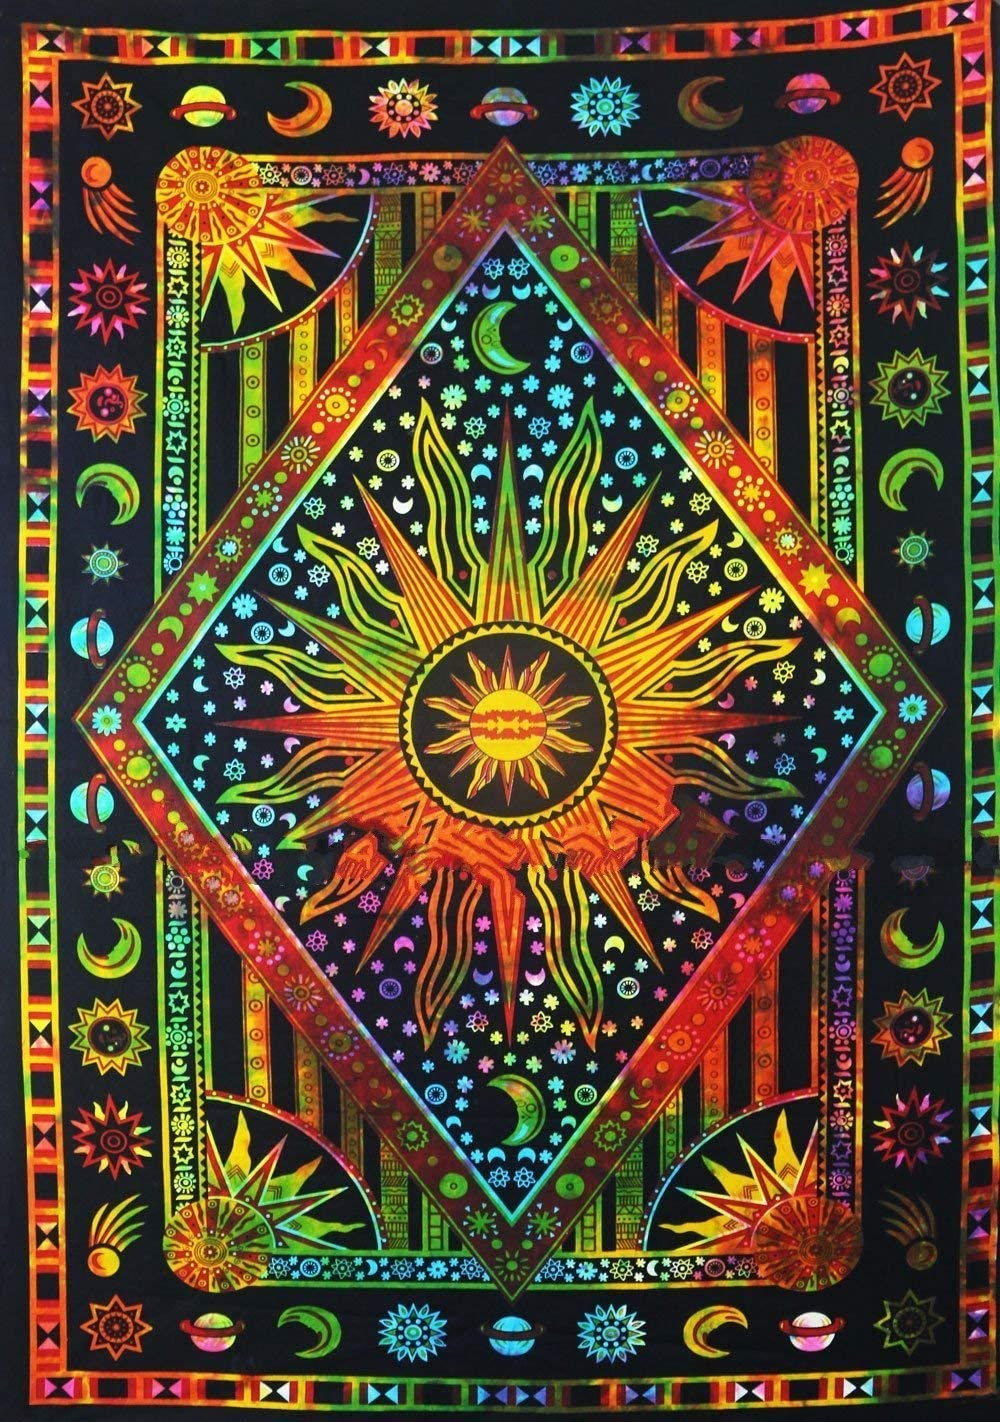 ANJANIYA Burning Sun Tie Dye Tapestry, Celestial Sun Moon Star Planet Bohemian Tapestry Tarot Card Wall Hanging Boho Hippie Hippy Beach Coverlet Curtain (Orange Multi, 54